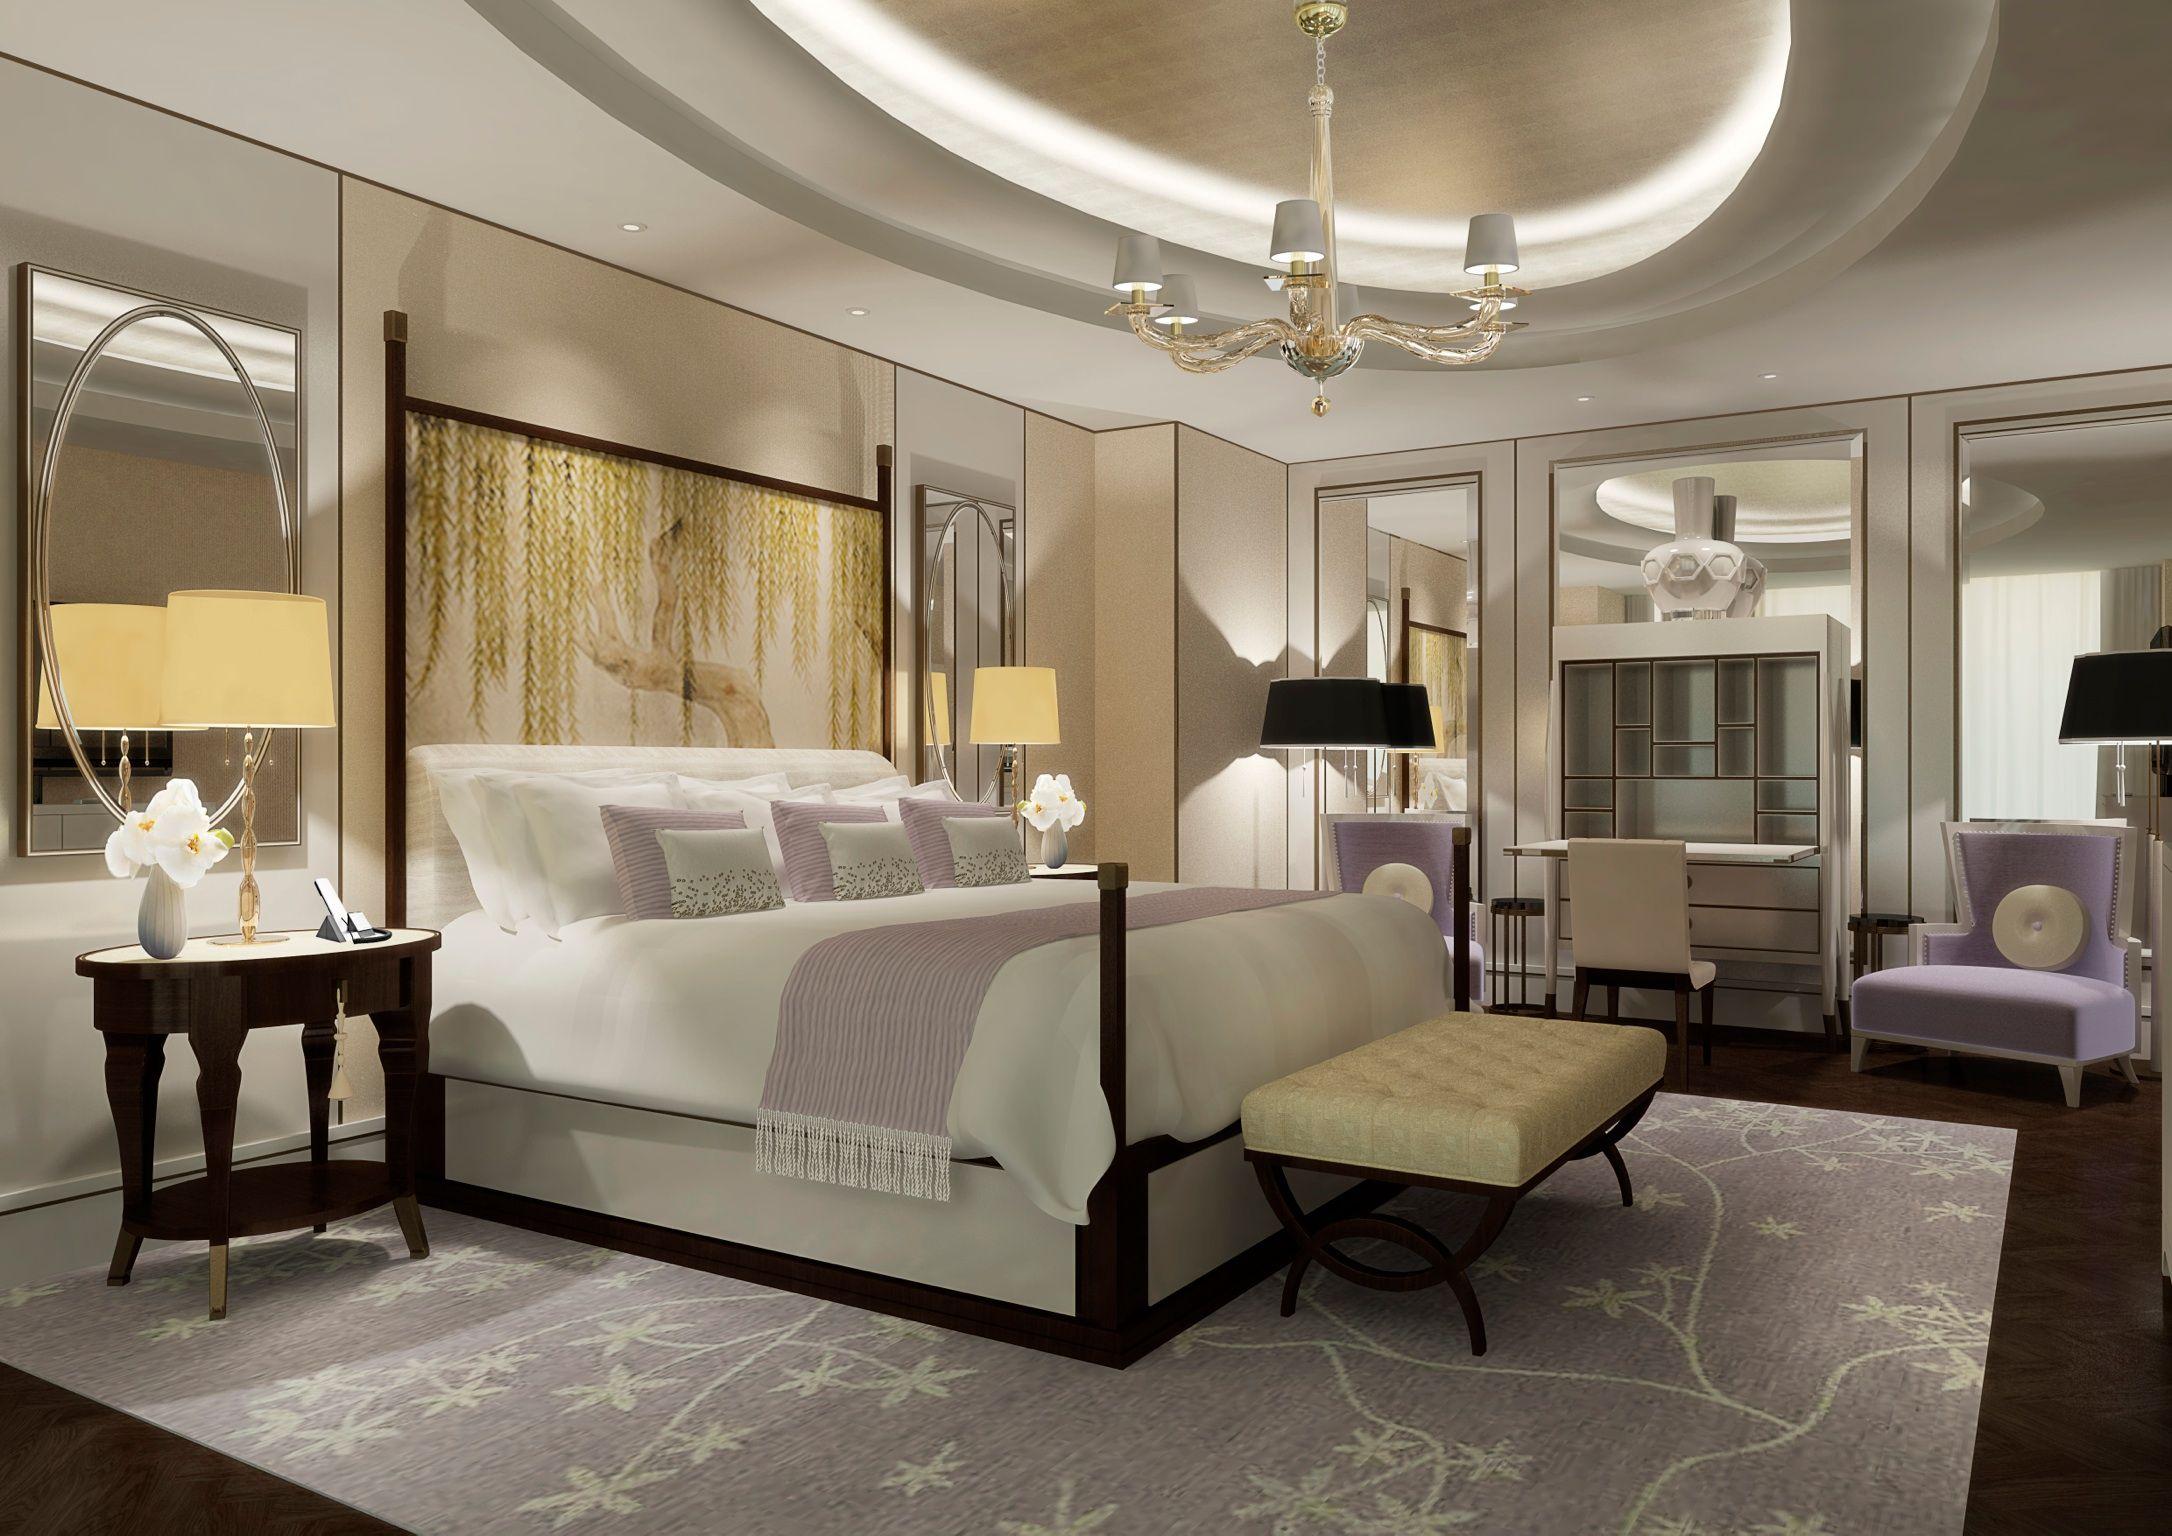 Infinity Suite Langham Chicago. Guest Rooms